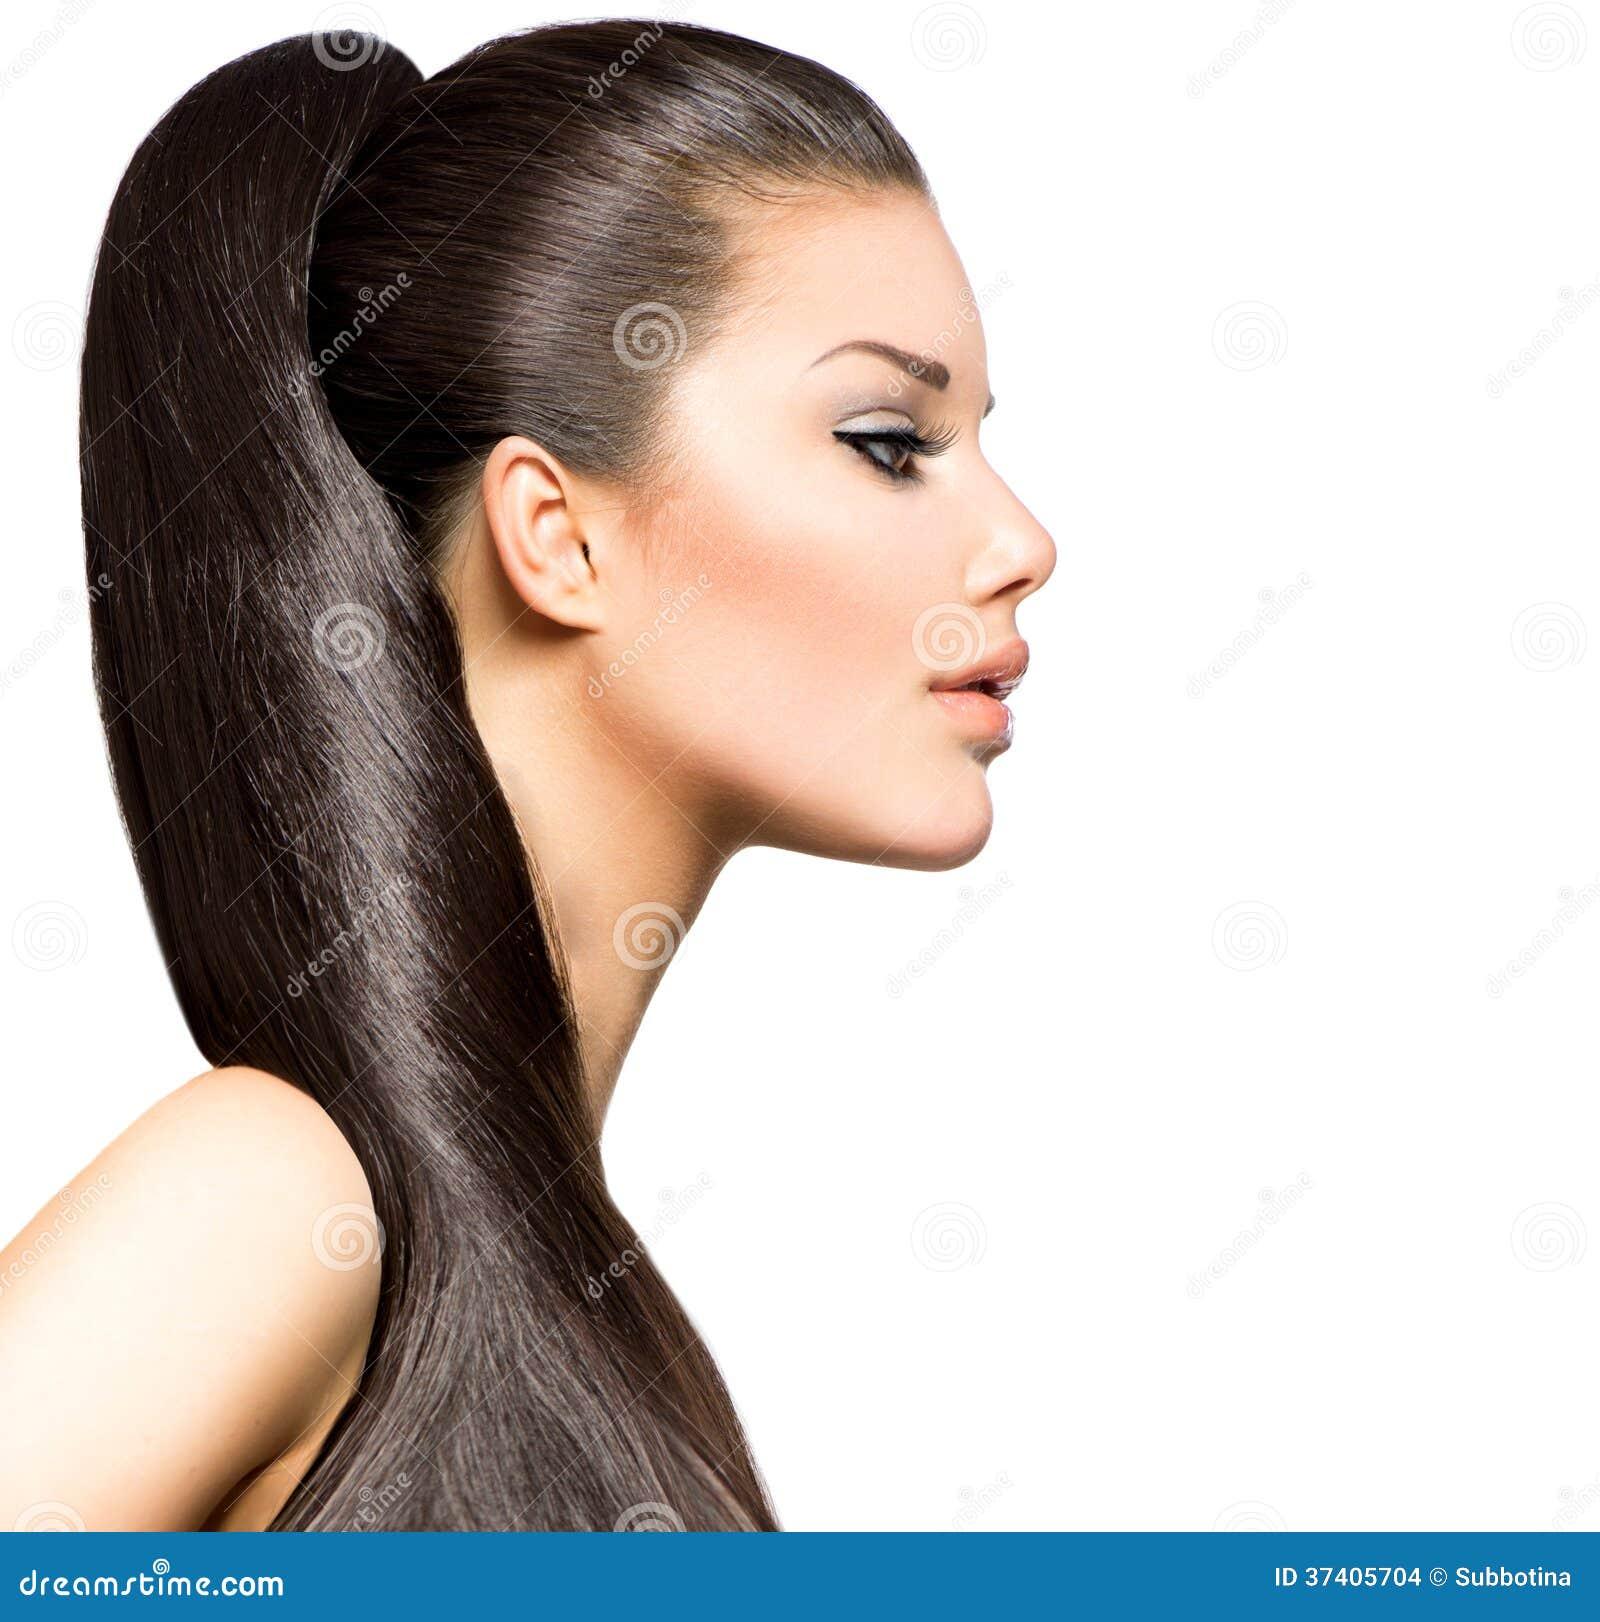 Fantastic Ponytail Hairstyle Stock Images Image 37405704 Short Hairstyles For Black Women Fulllsitofus